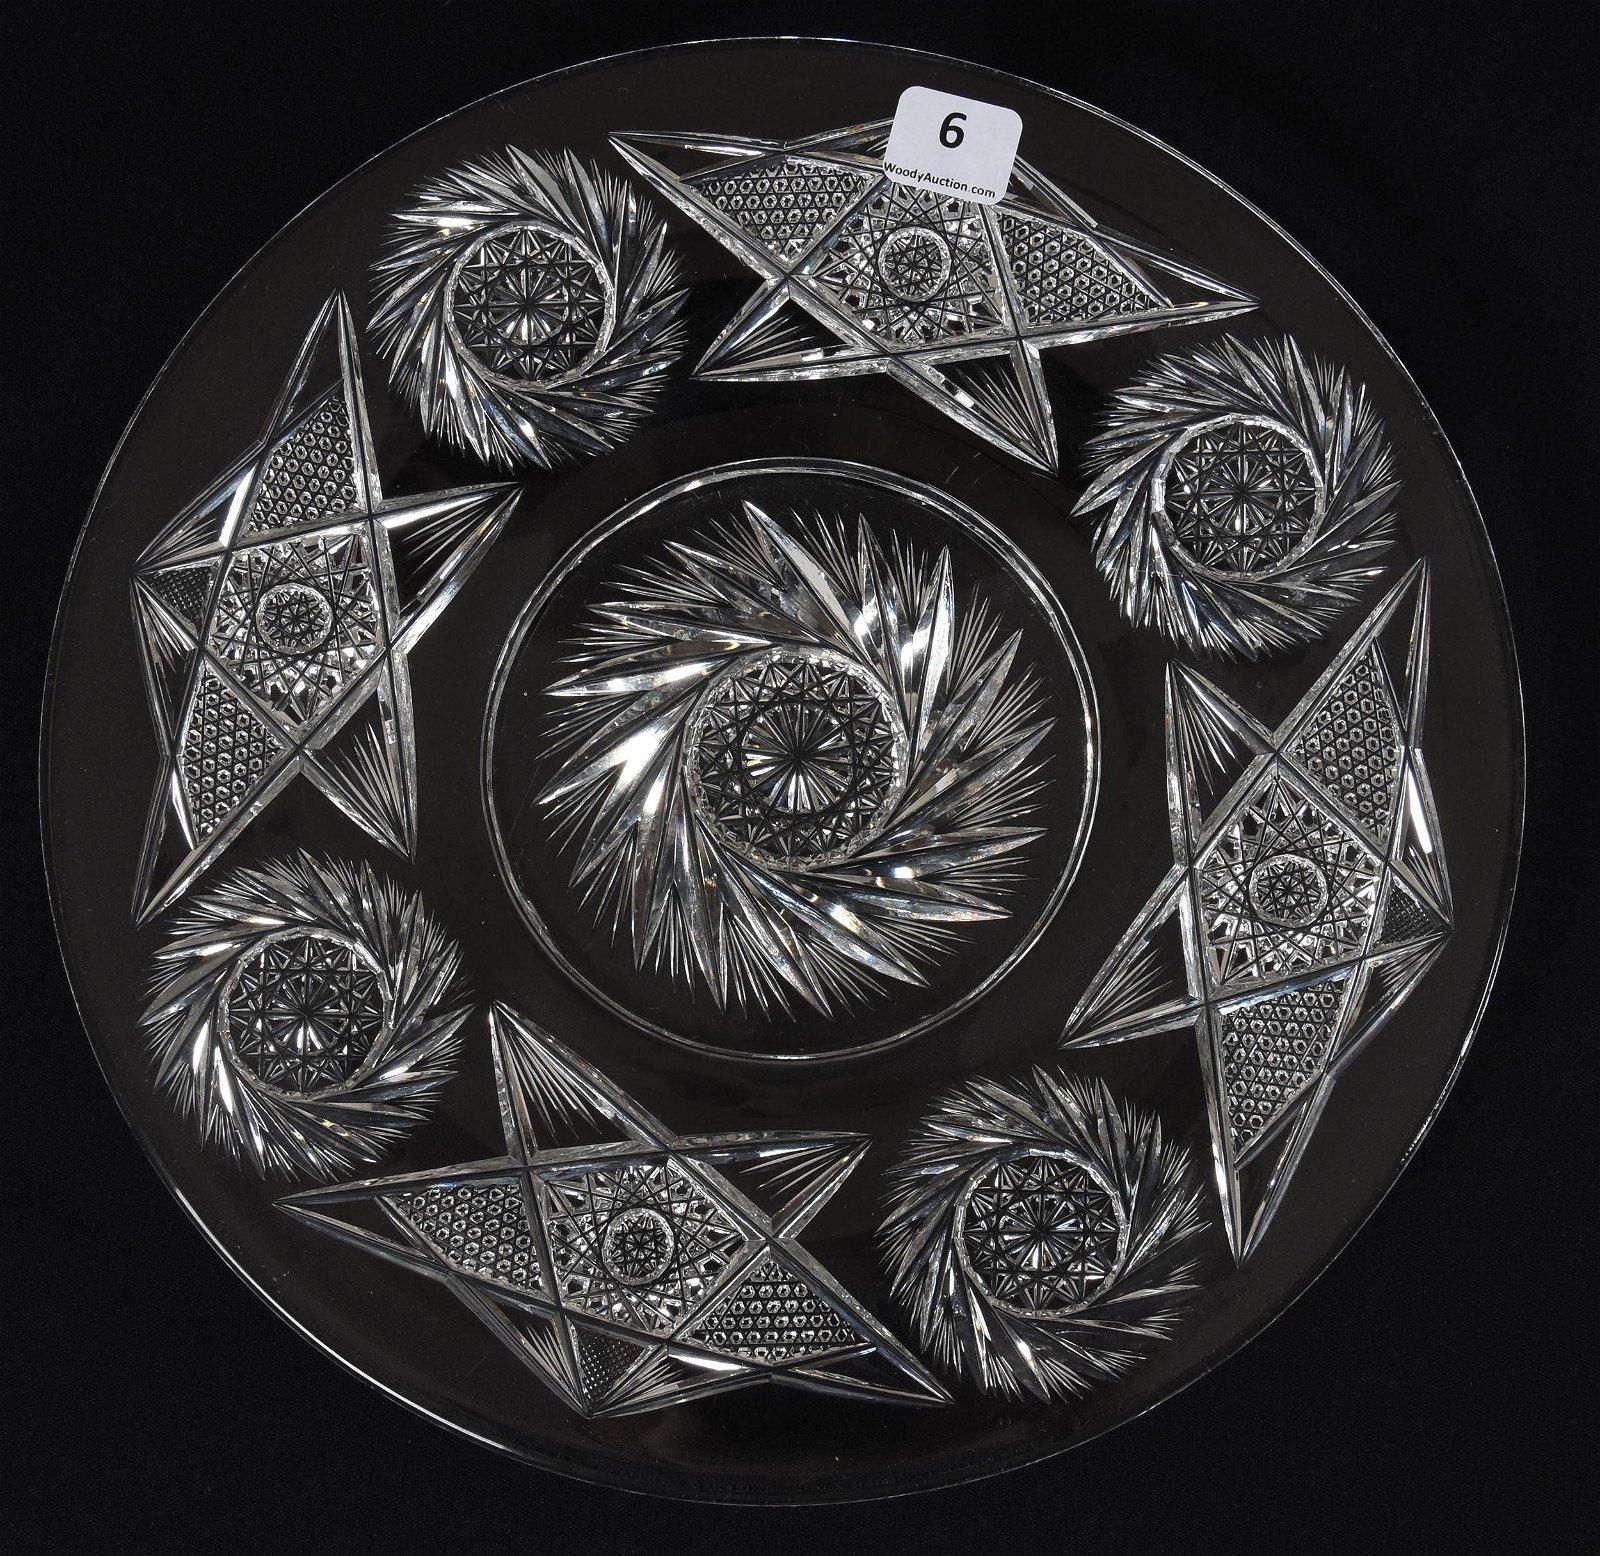 Plate, American Brilliant Cut Glass